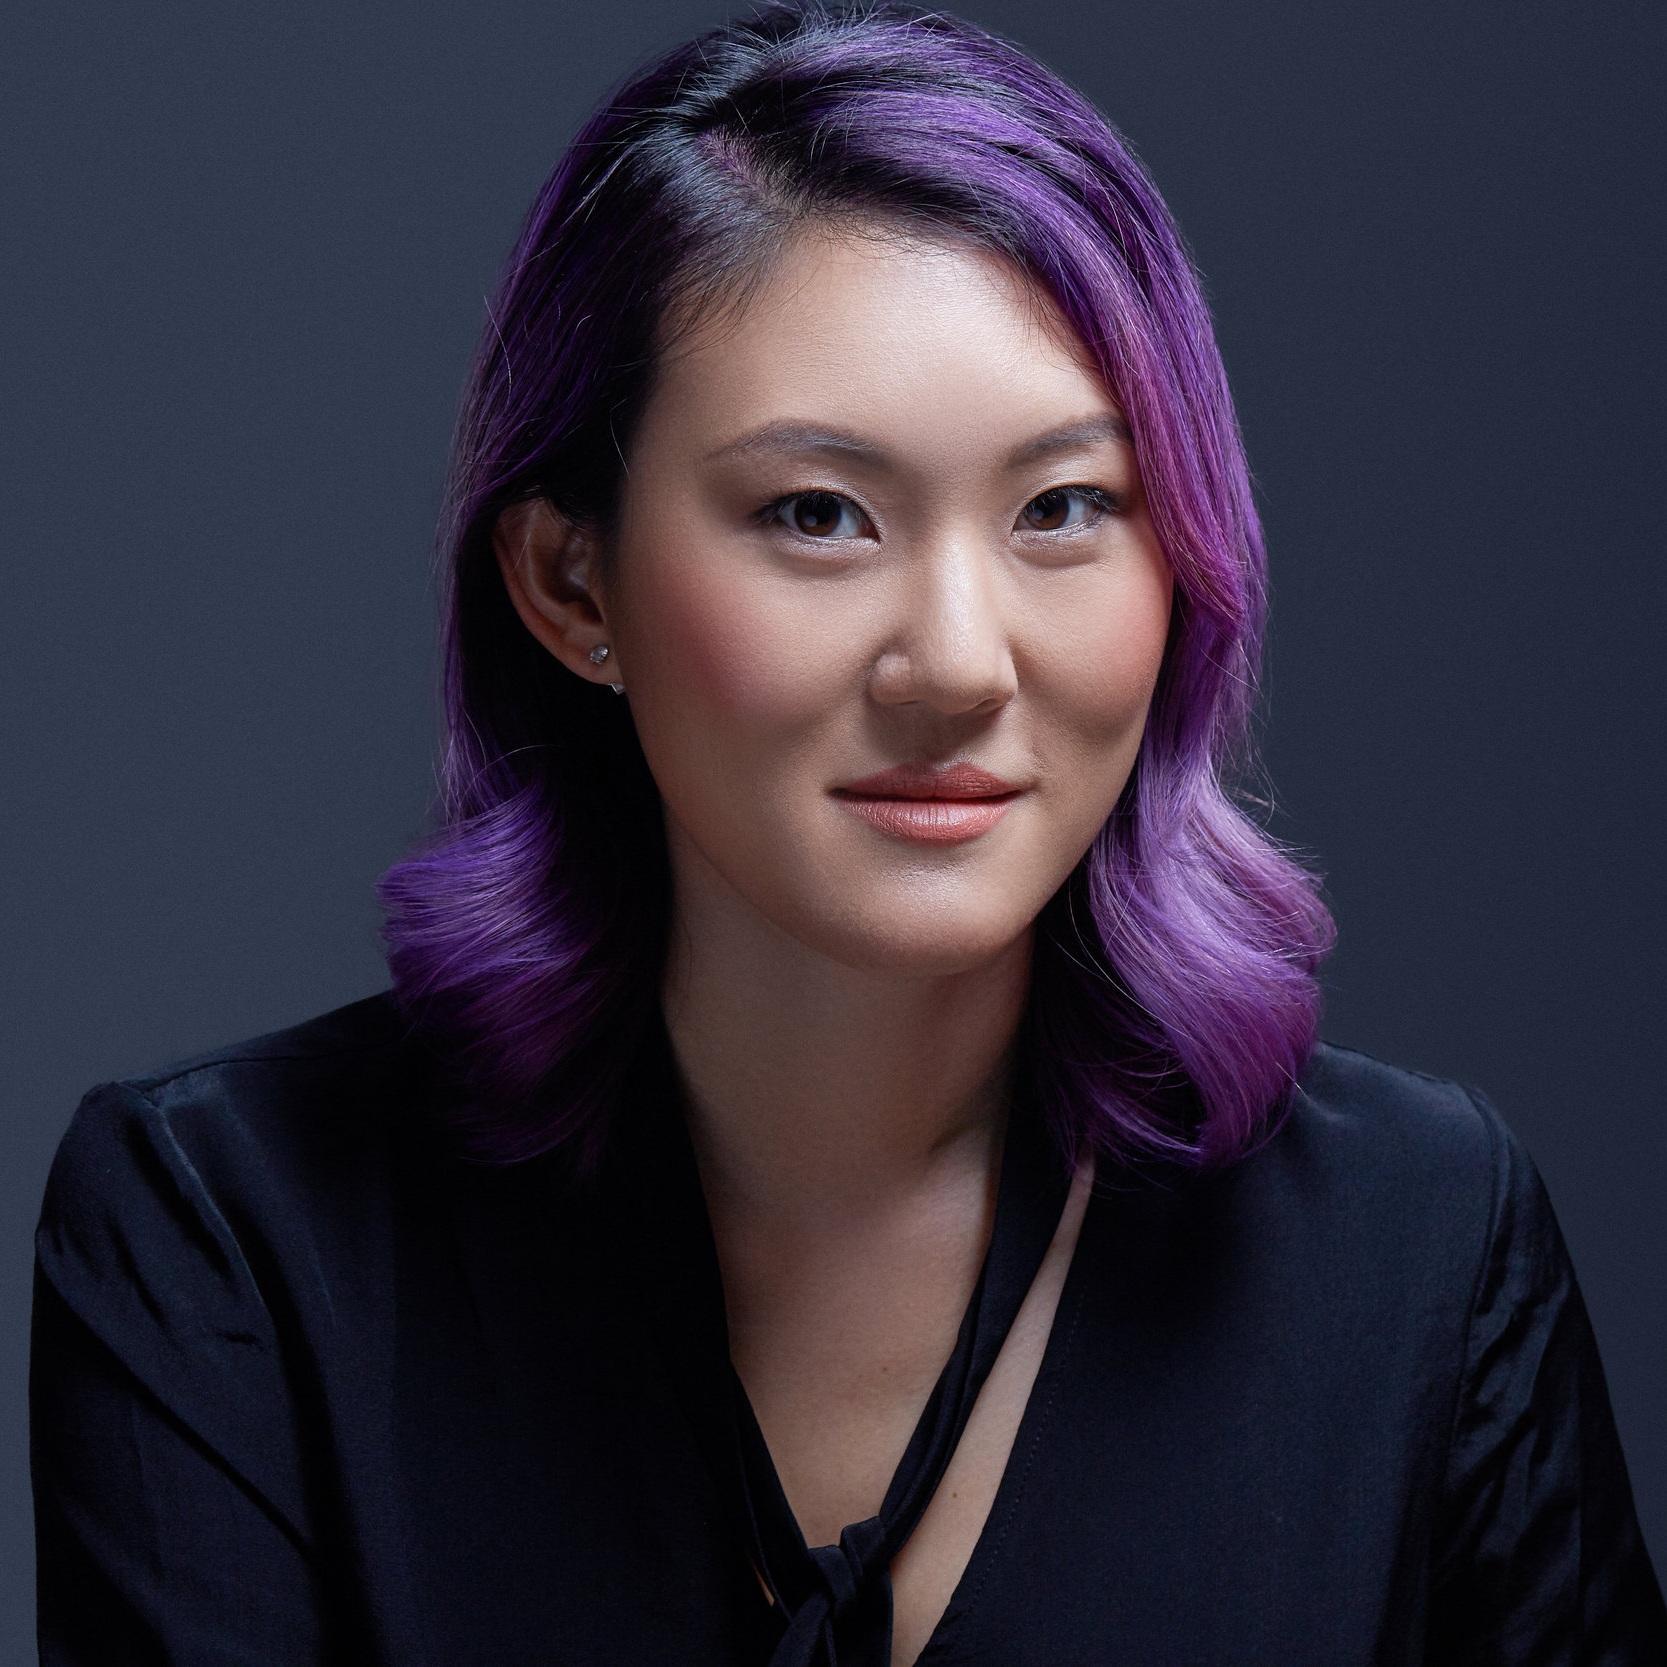 Jessie Lam - LinkedIn